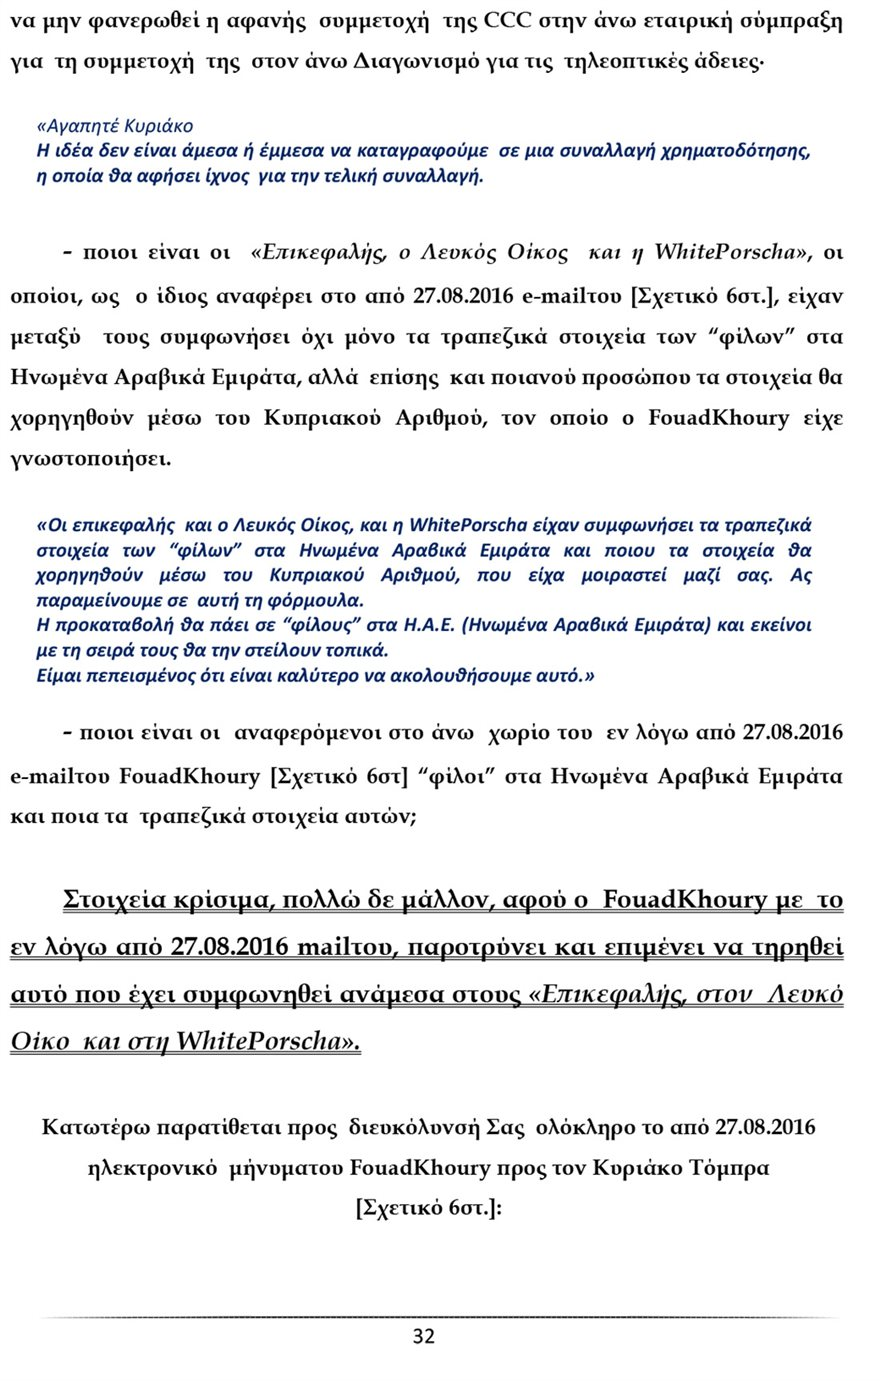 ypomnima-32